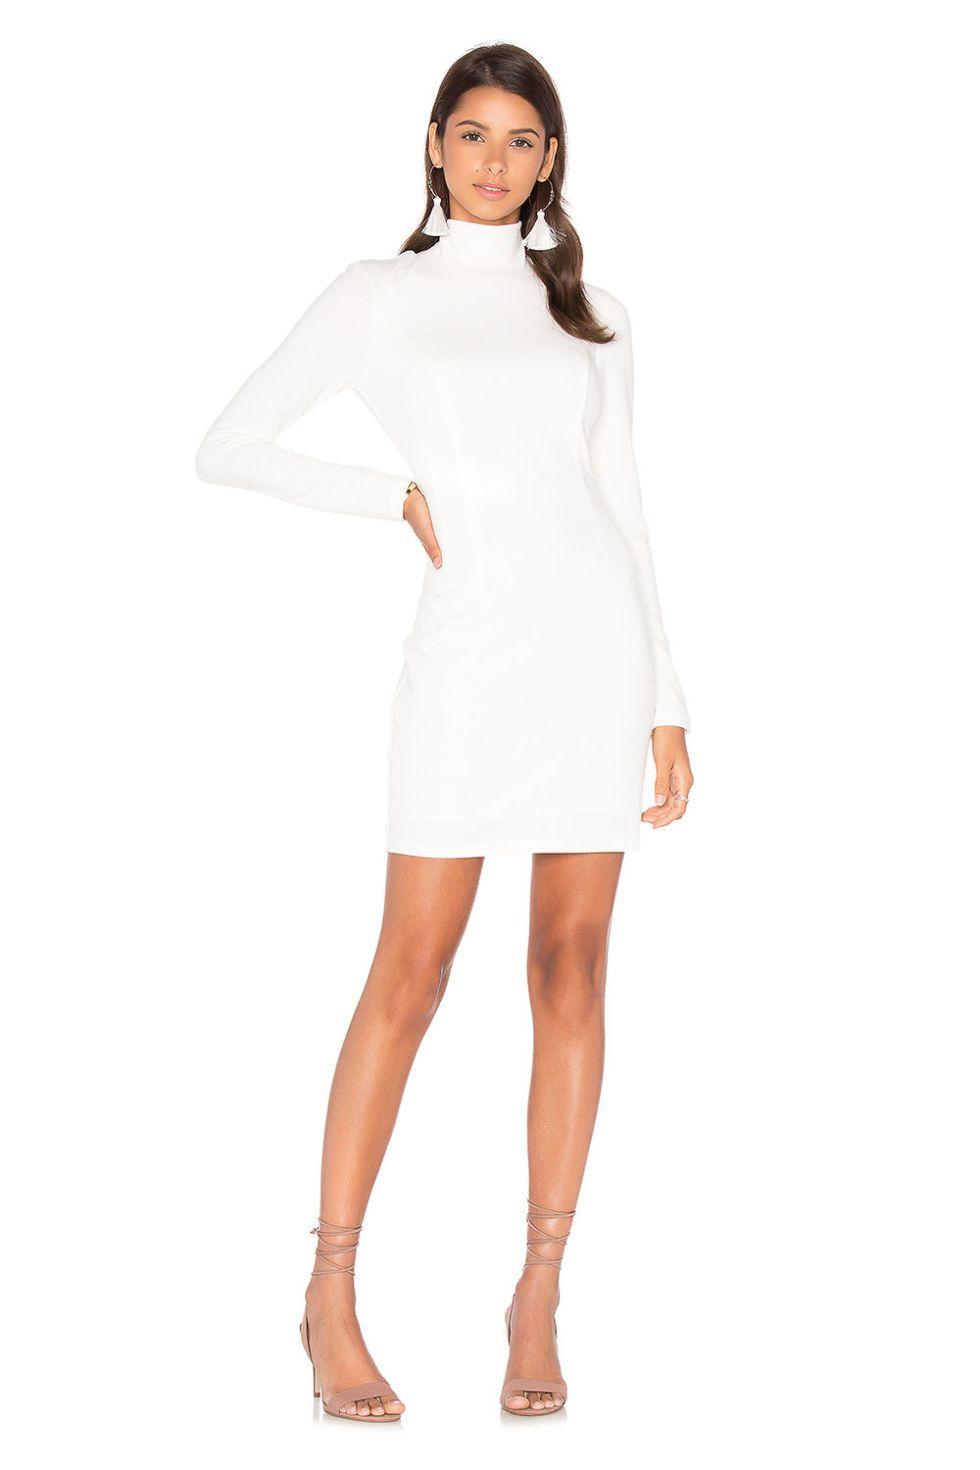 White Fashion Long Sleeve Turtleneck Dress In 2021 Turtle Neck Dress Long Sleeve High Neck Dress Fashion [ 1200 x 800 Pixel ]